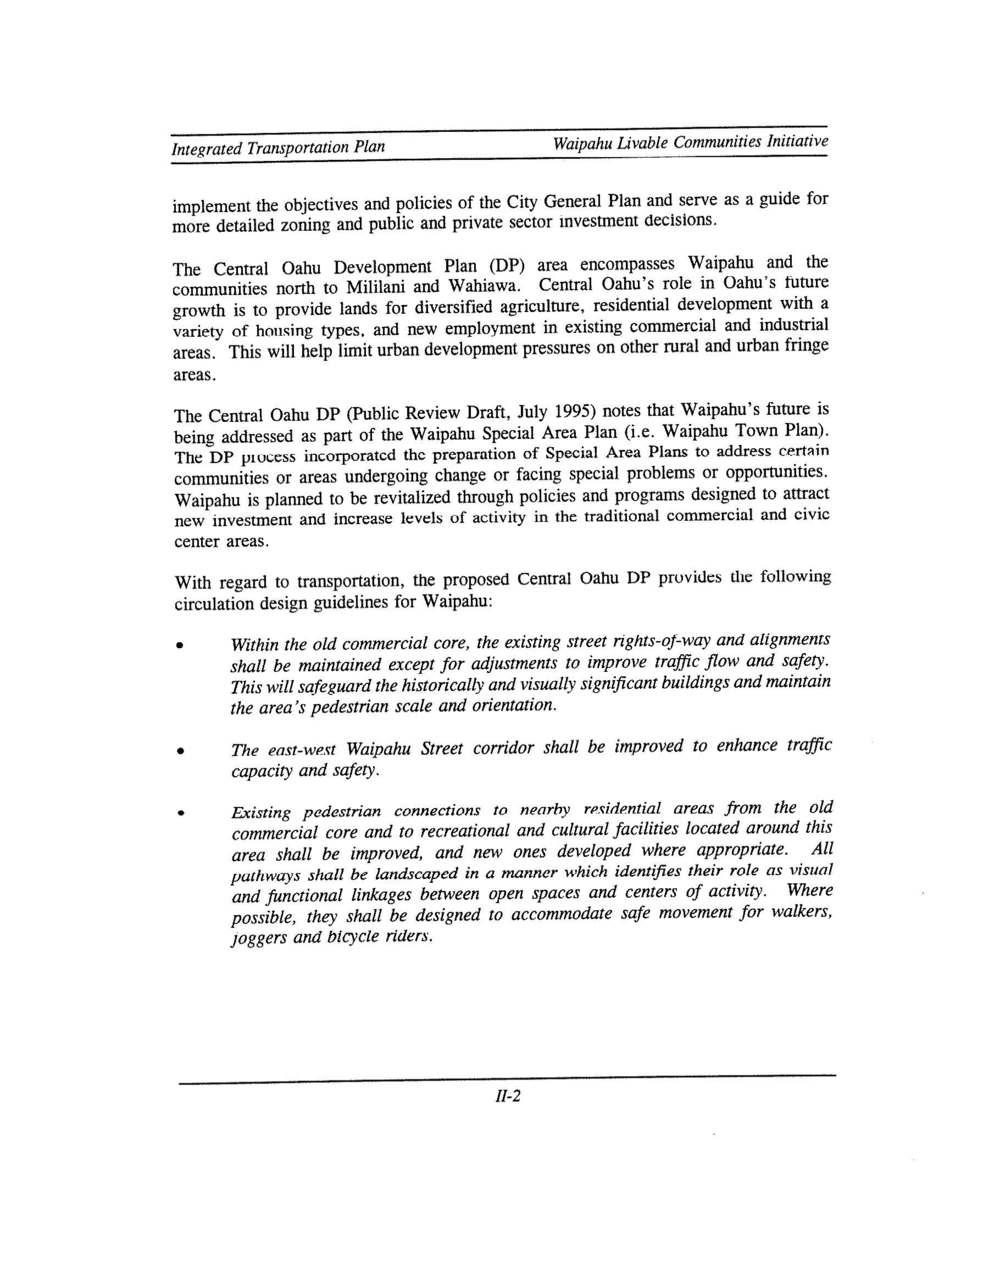 160531_WaipahuLivableCommunities(1998)_Page_017.jpg